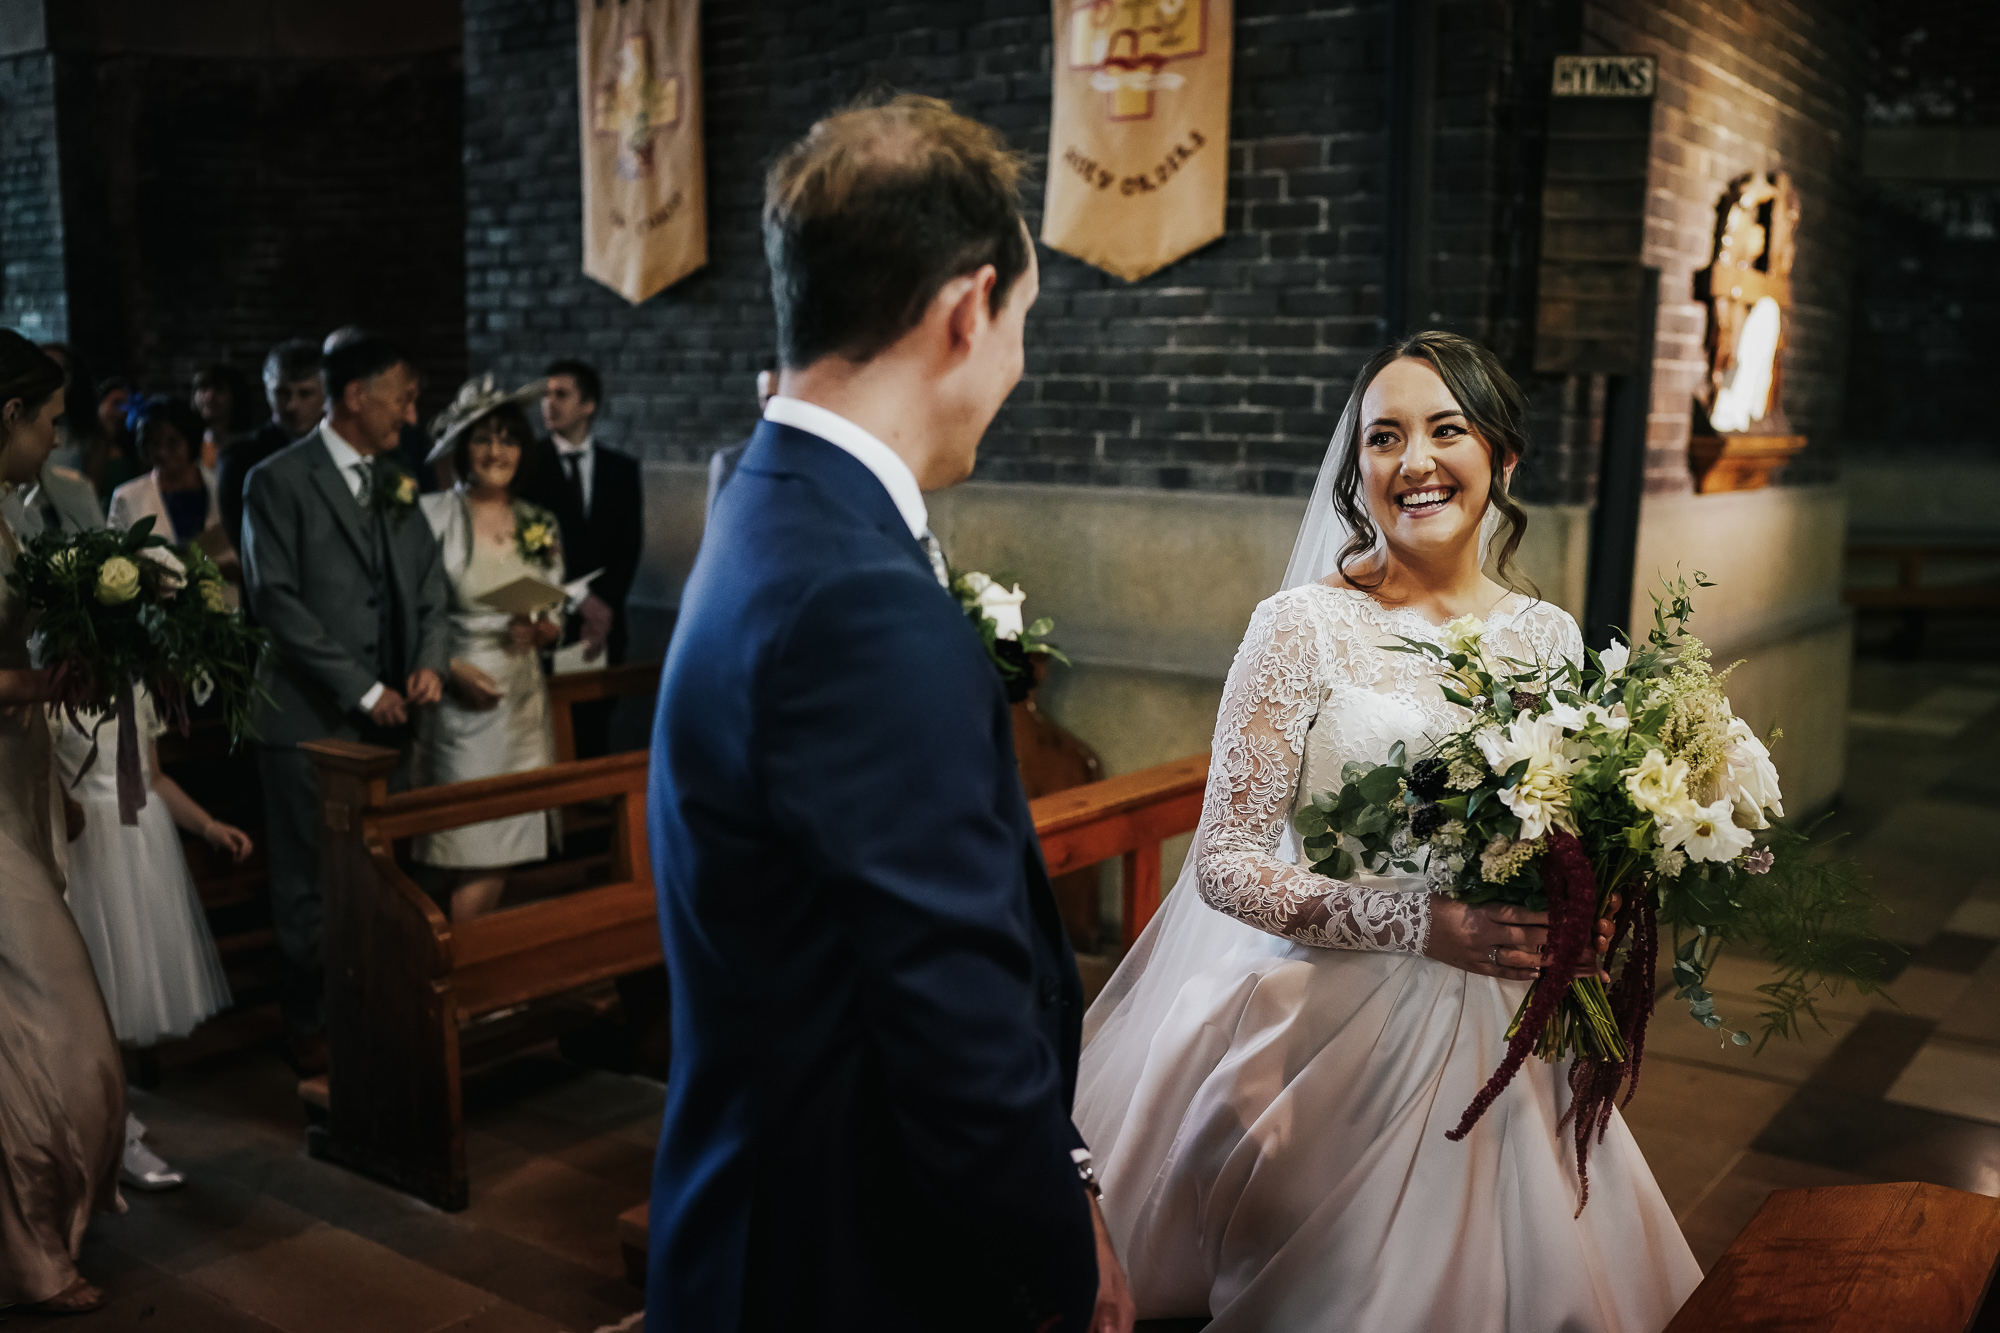 Thornton Manor Cheshire wedding photographer Wedding Photography Cheshire wedding photographer (22 of 64).jpg